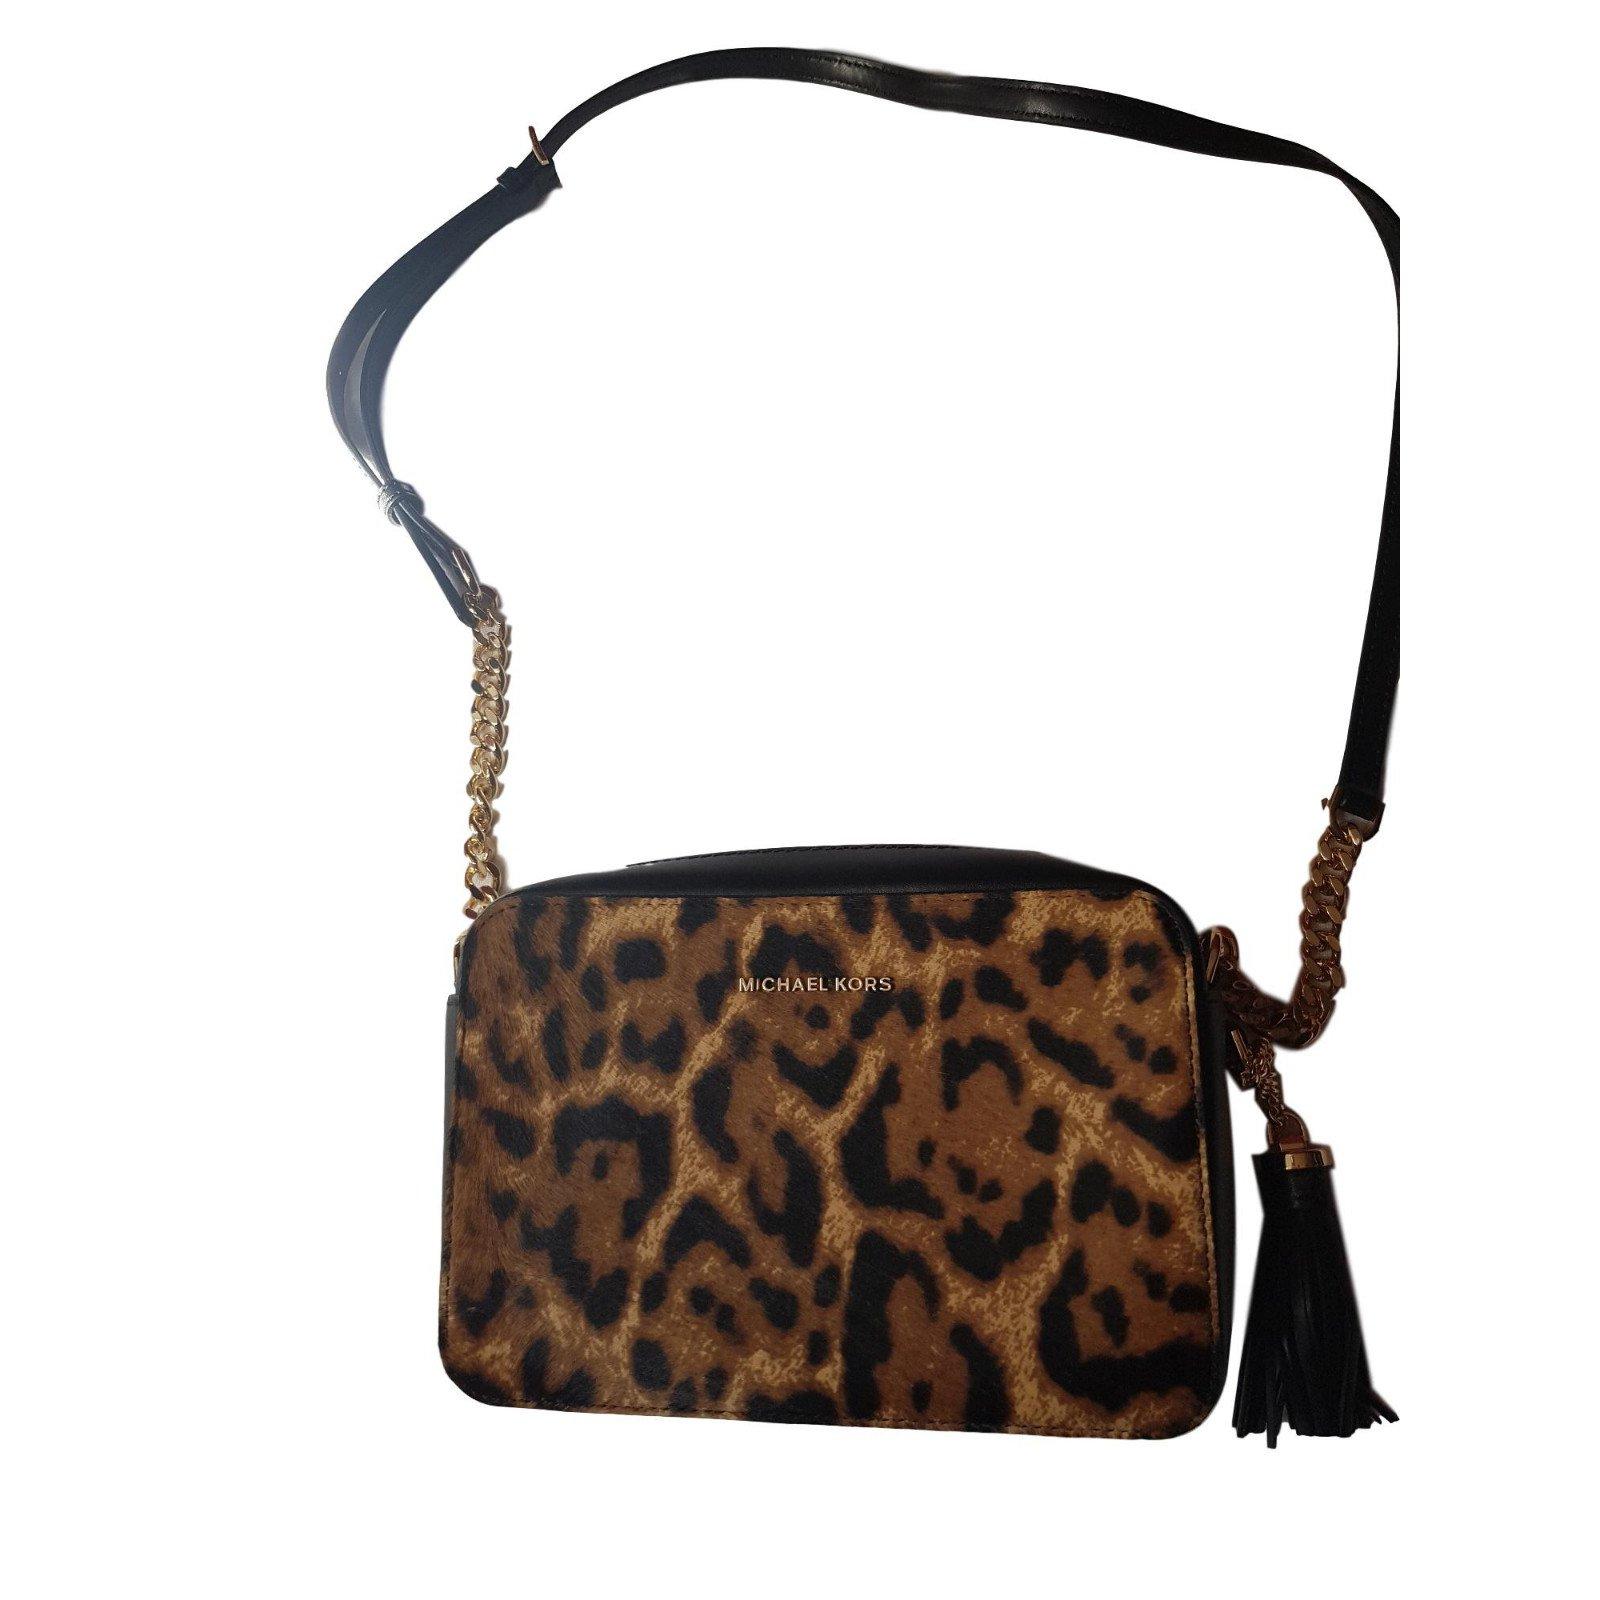 5a75b22006dc Michael Kors Handbags Handbags Leather Leopard print ref.73077 ...